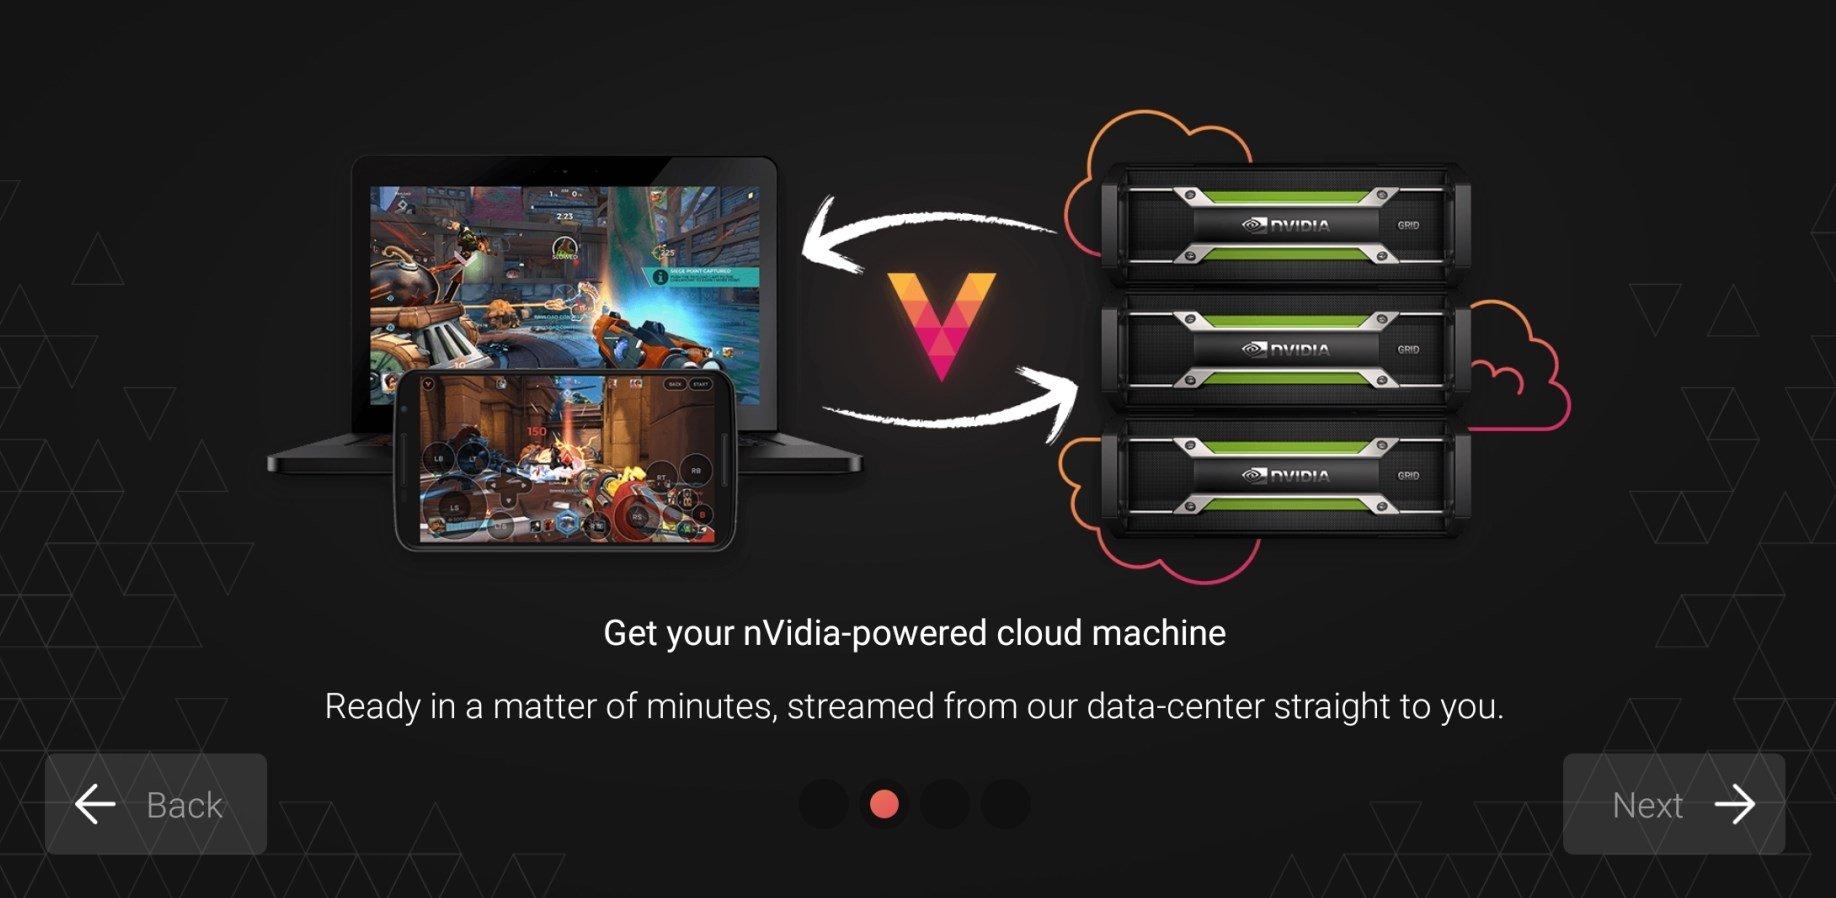 Gaming free cloud vortex account sam.leonardjoel.com.au Free